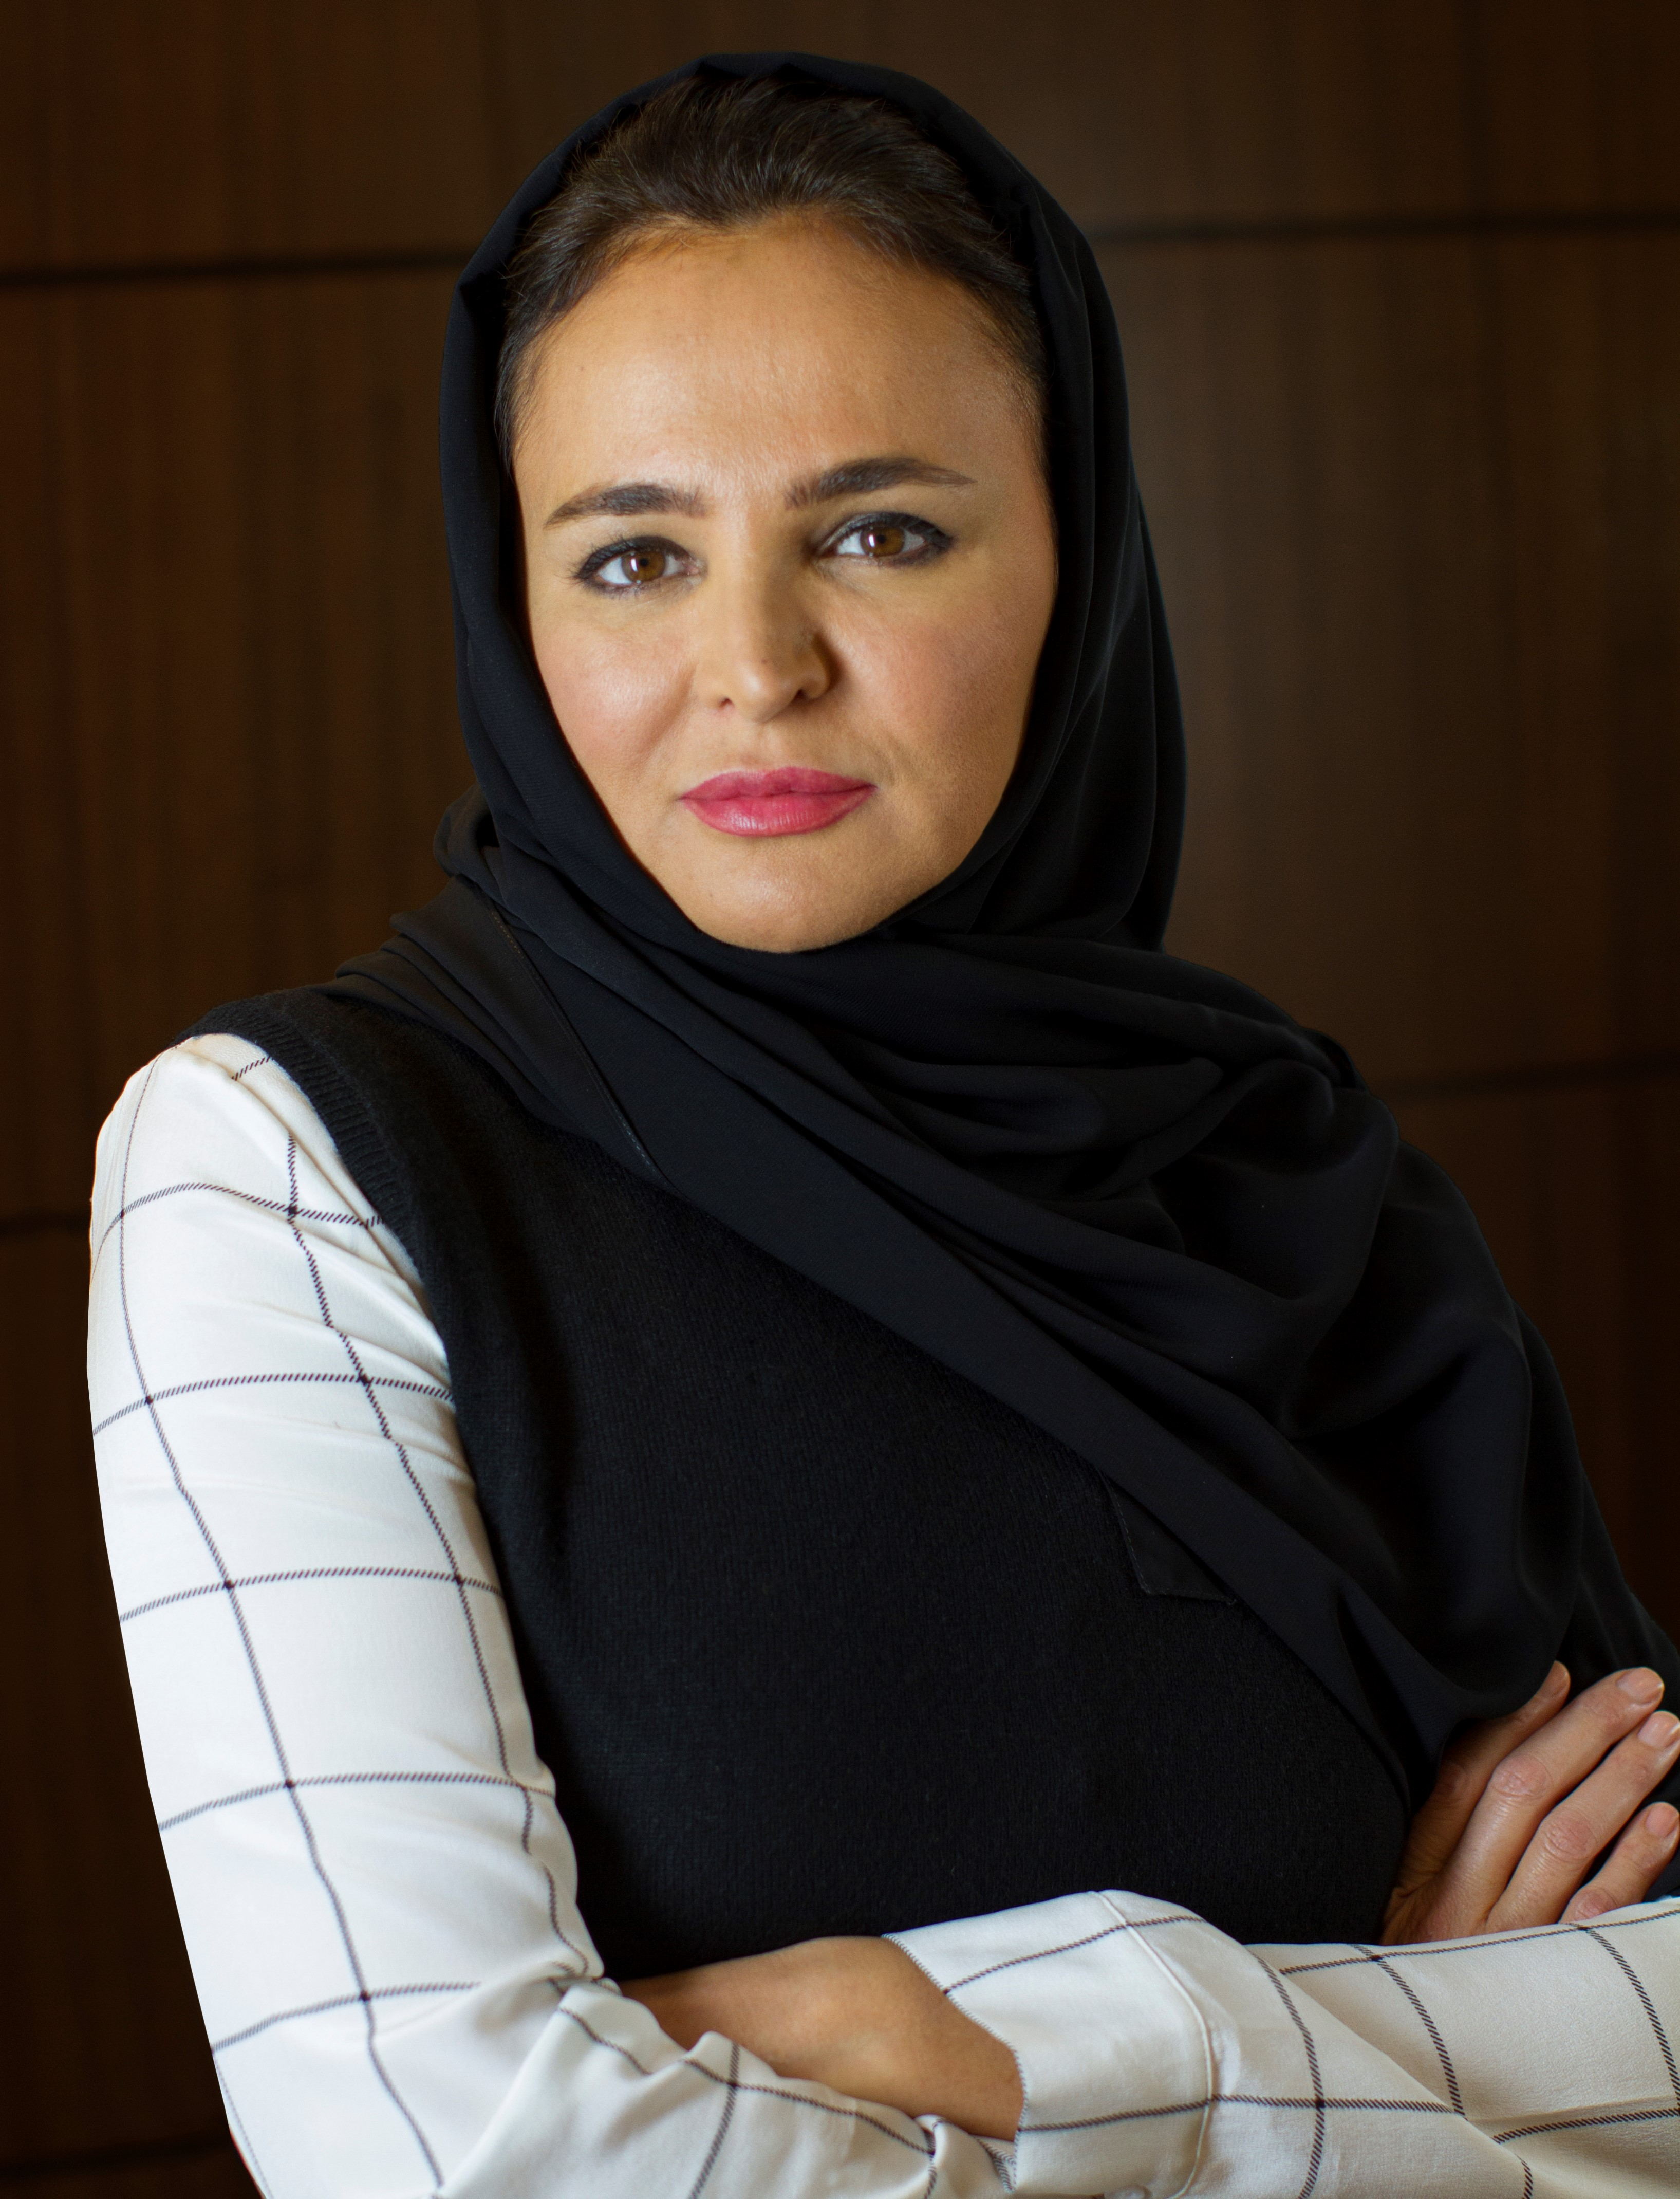 Sheikha Hanadi Bint Nasser Al Thani Recognized at Global Influential Leaders' Awards